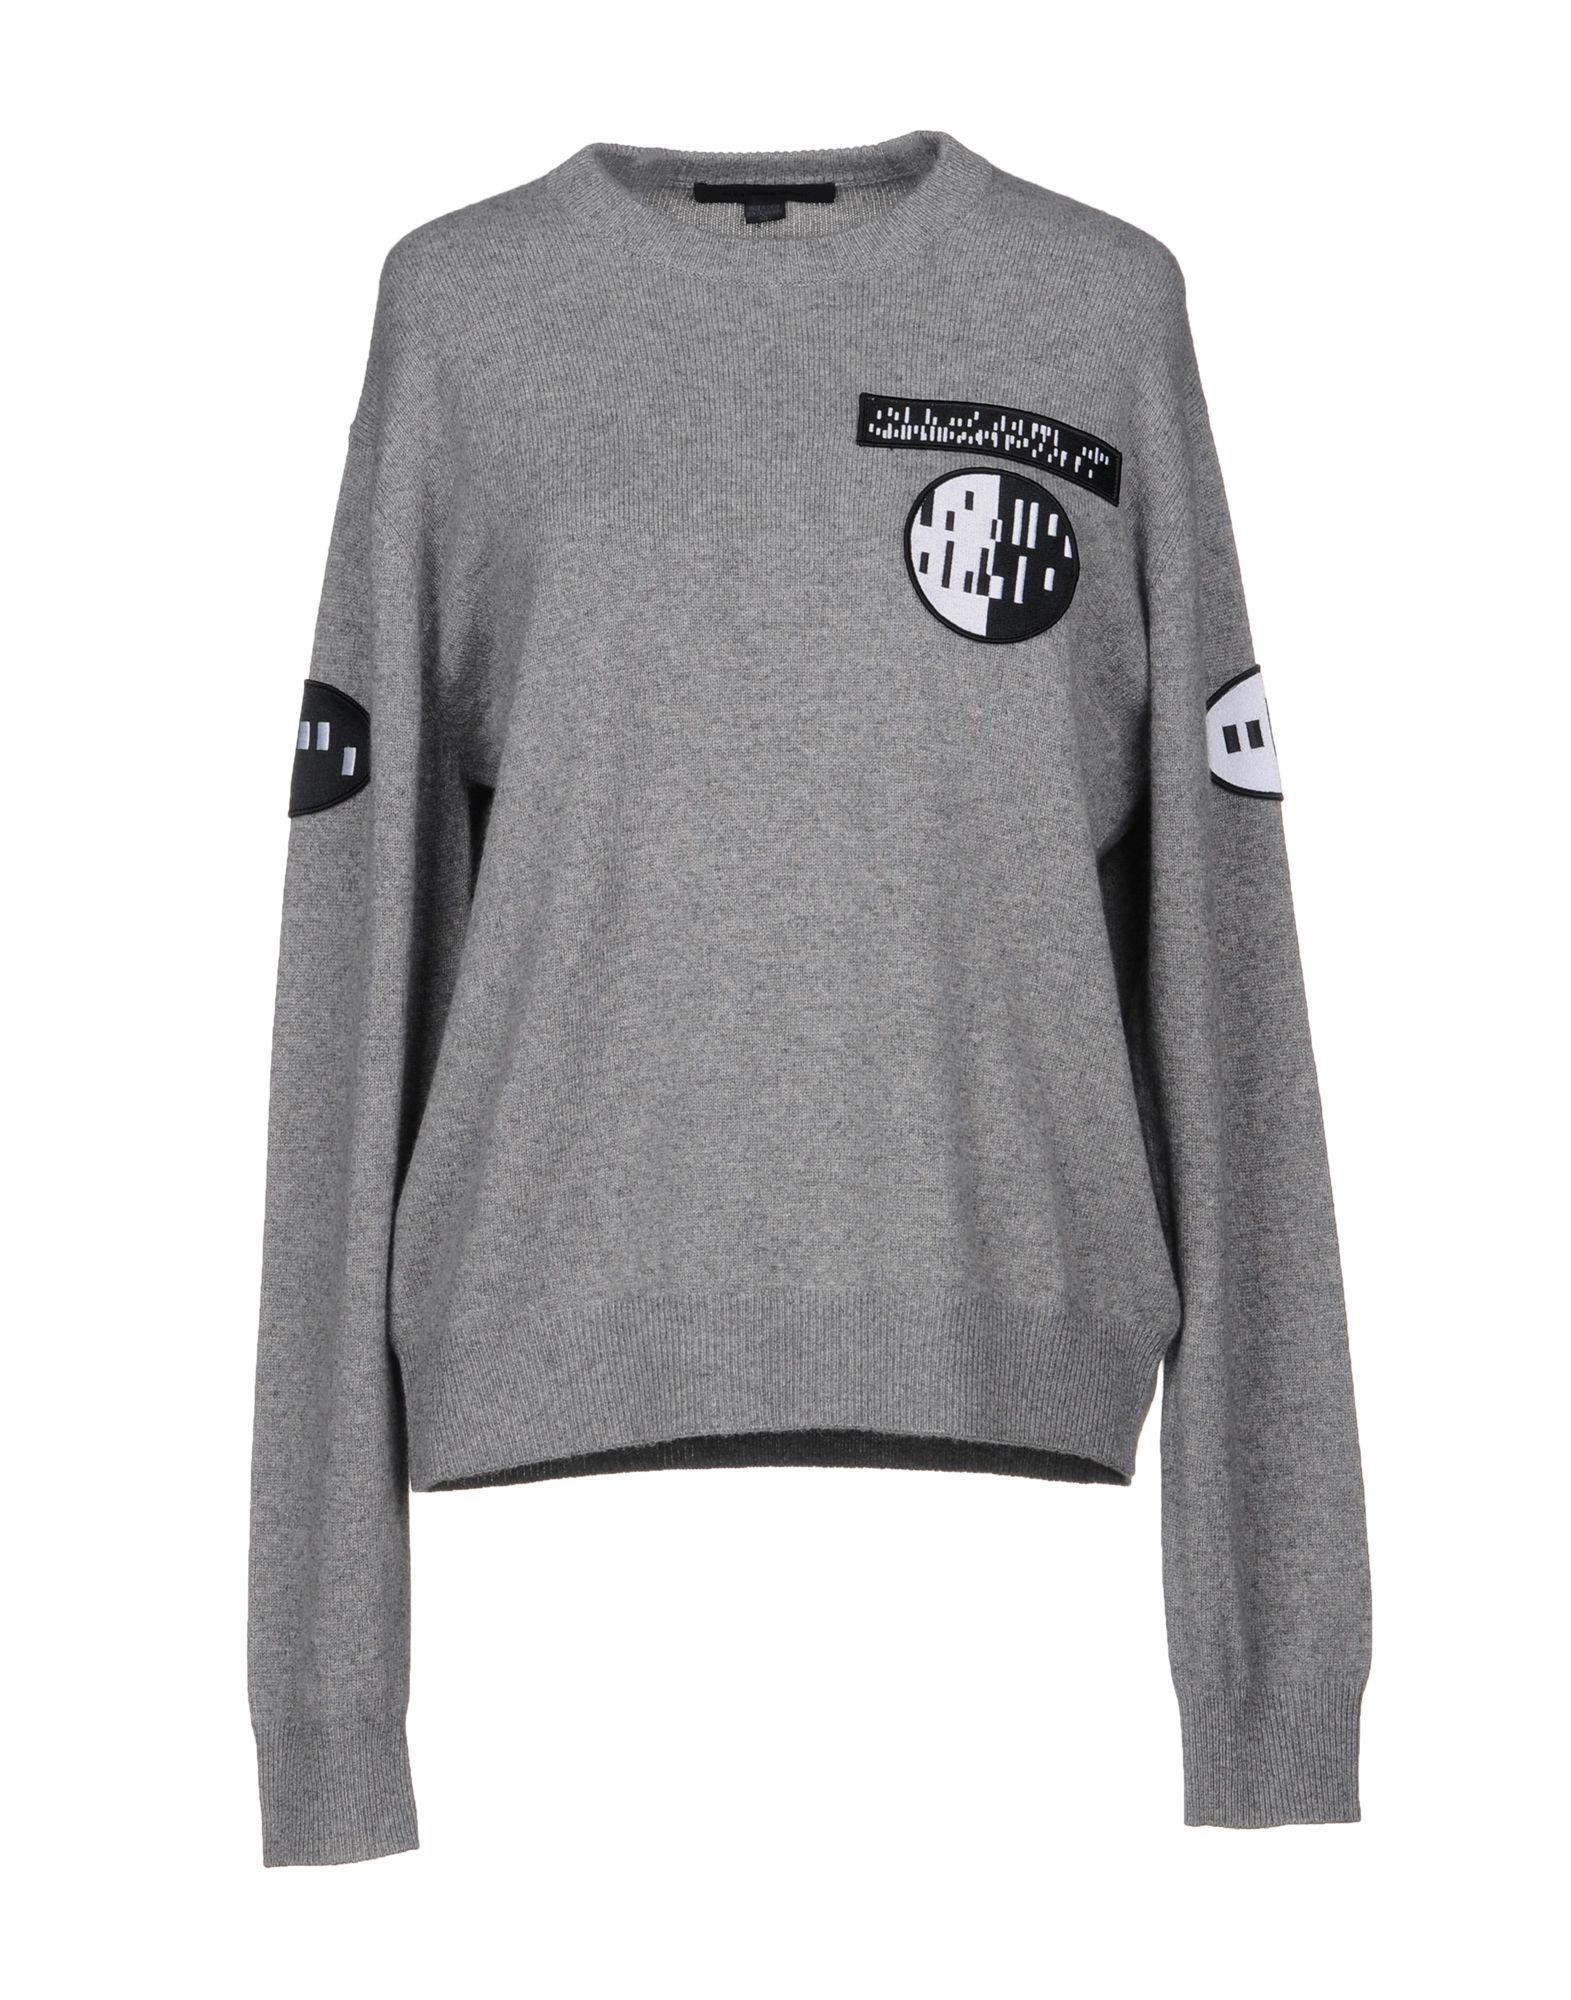 Alexander Wang Sweaters In Grey